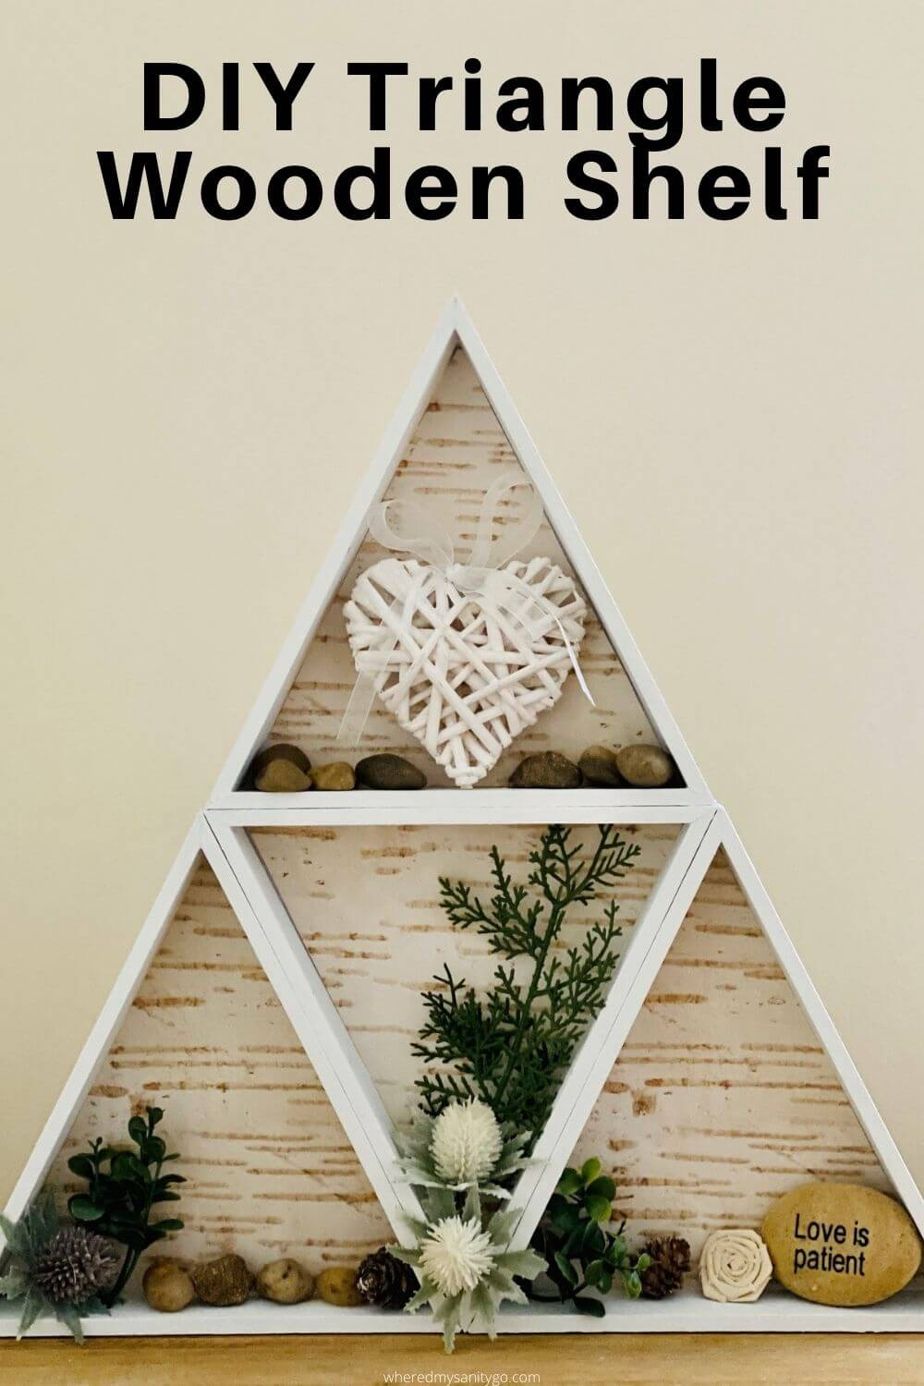 DIY Triangle Wooden Shelf